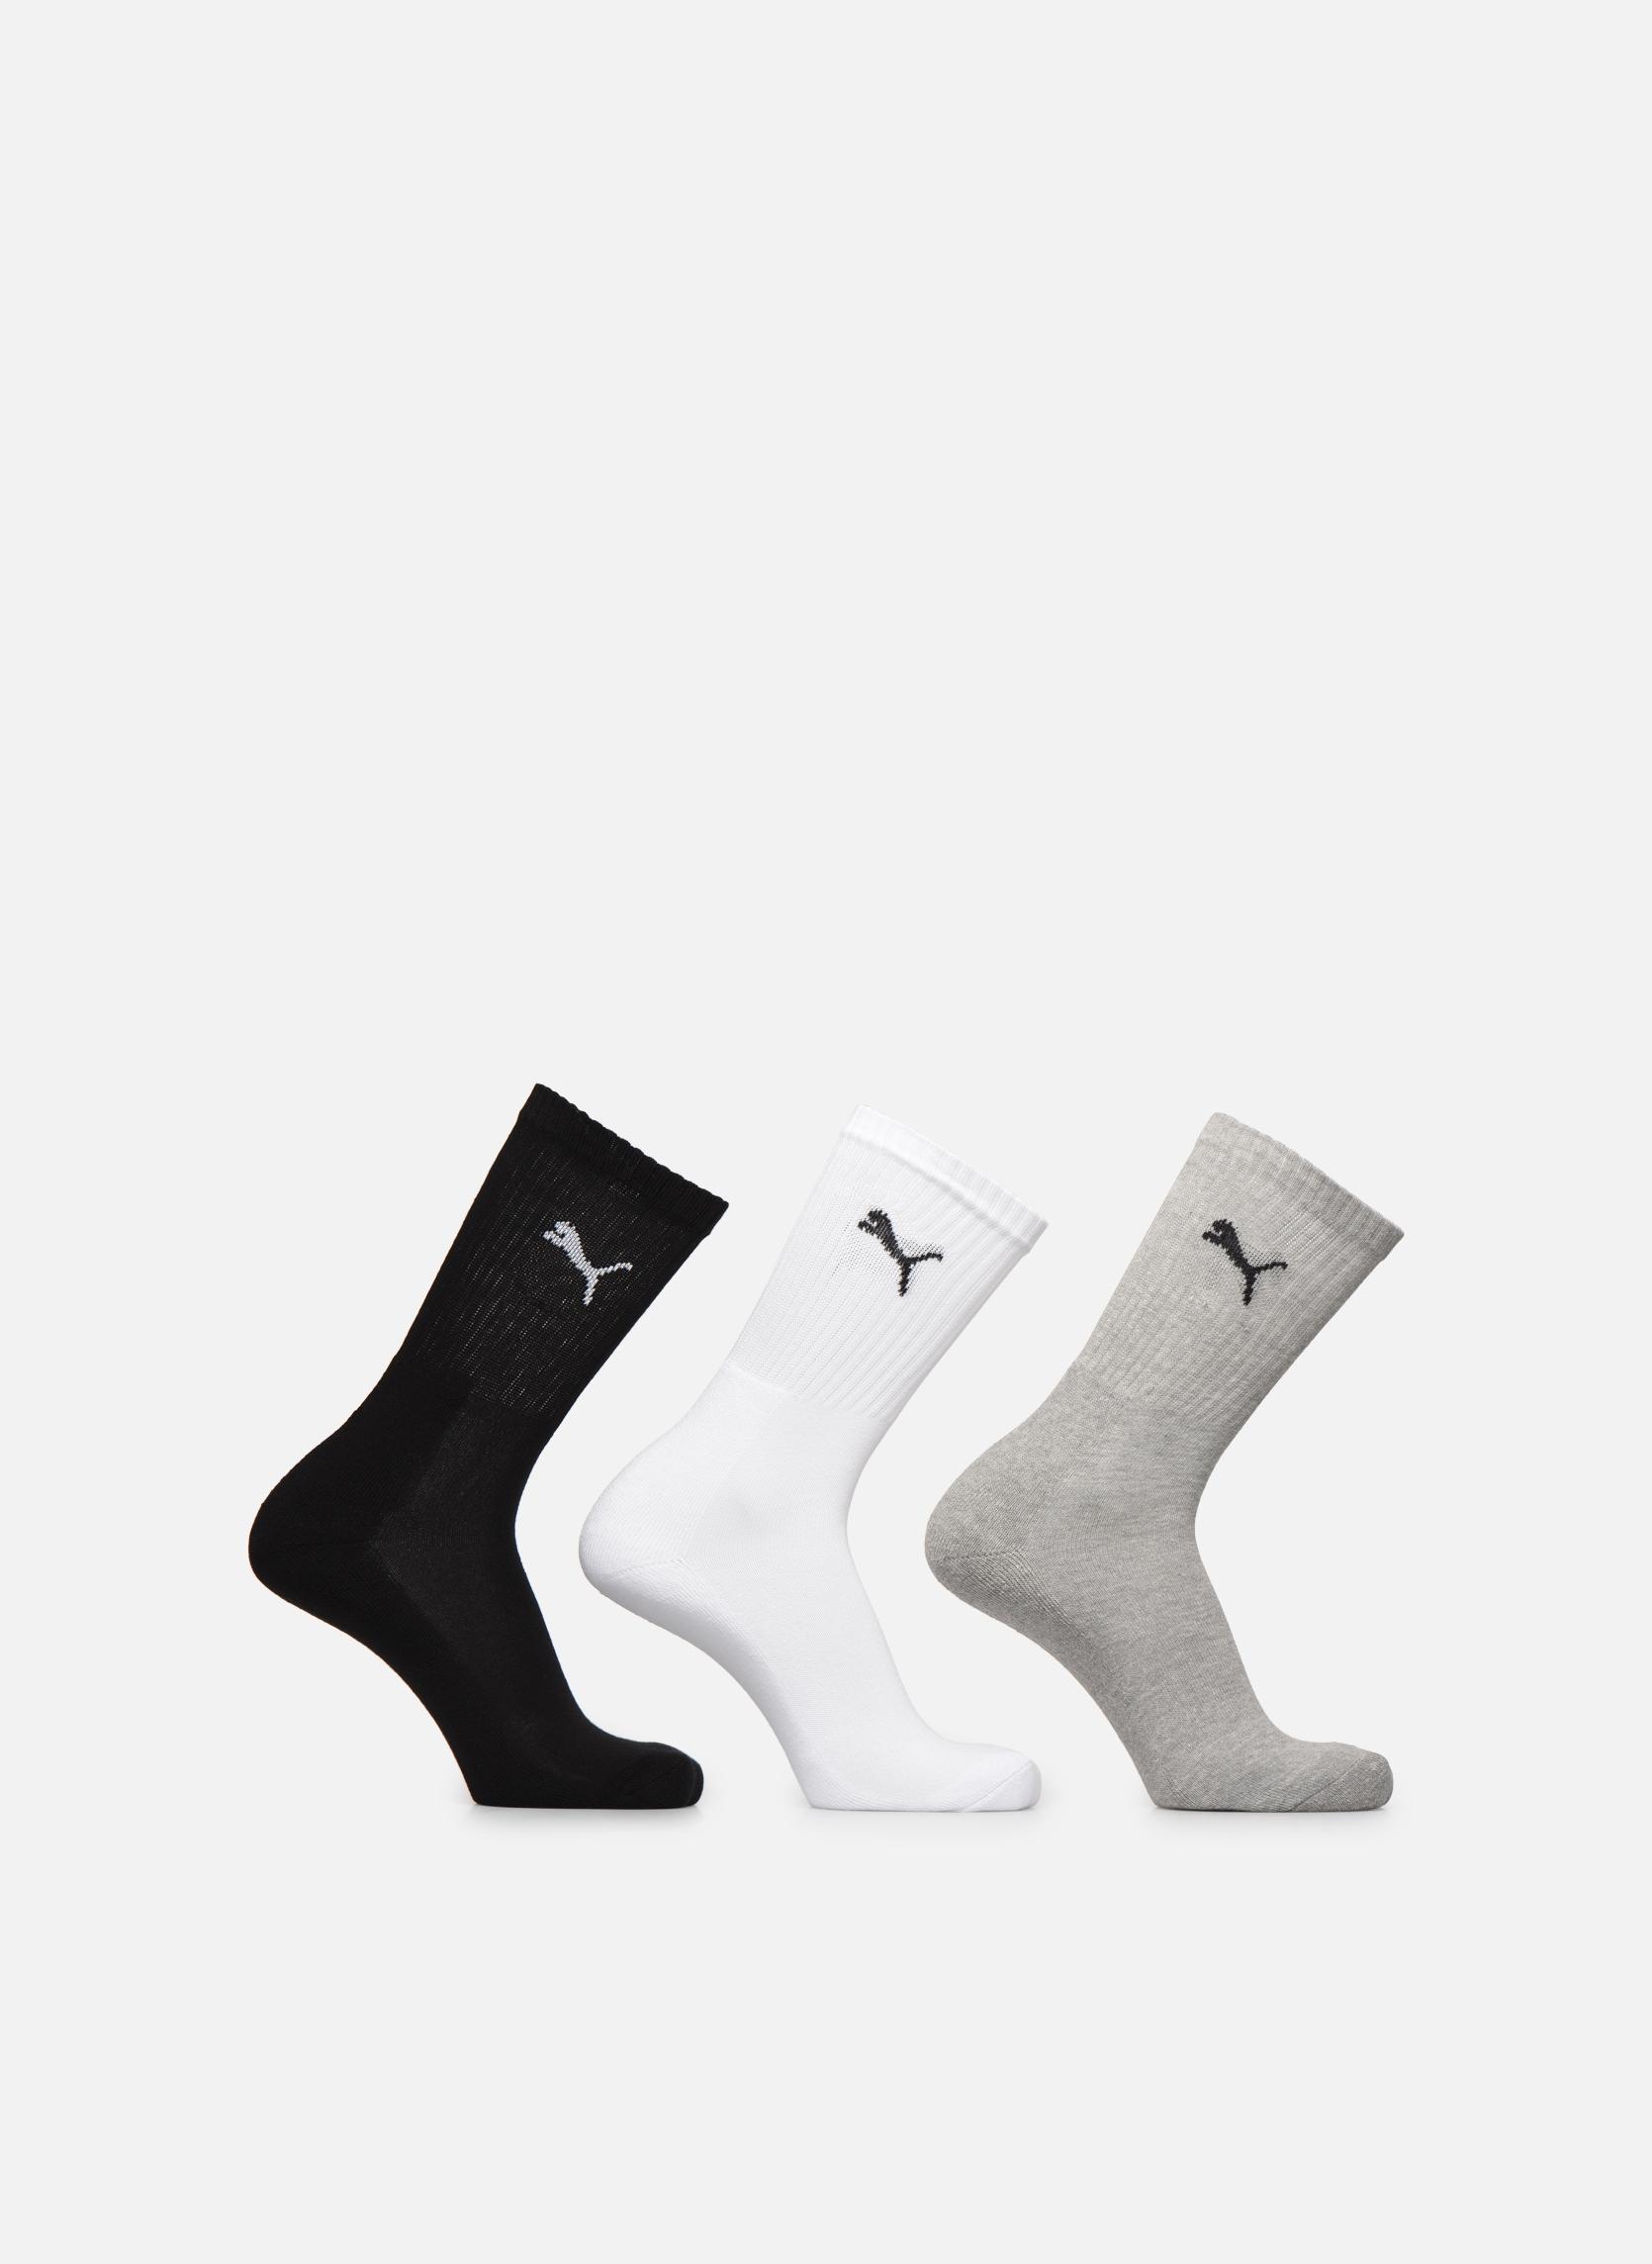 325 white grey black